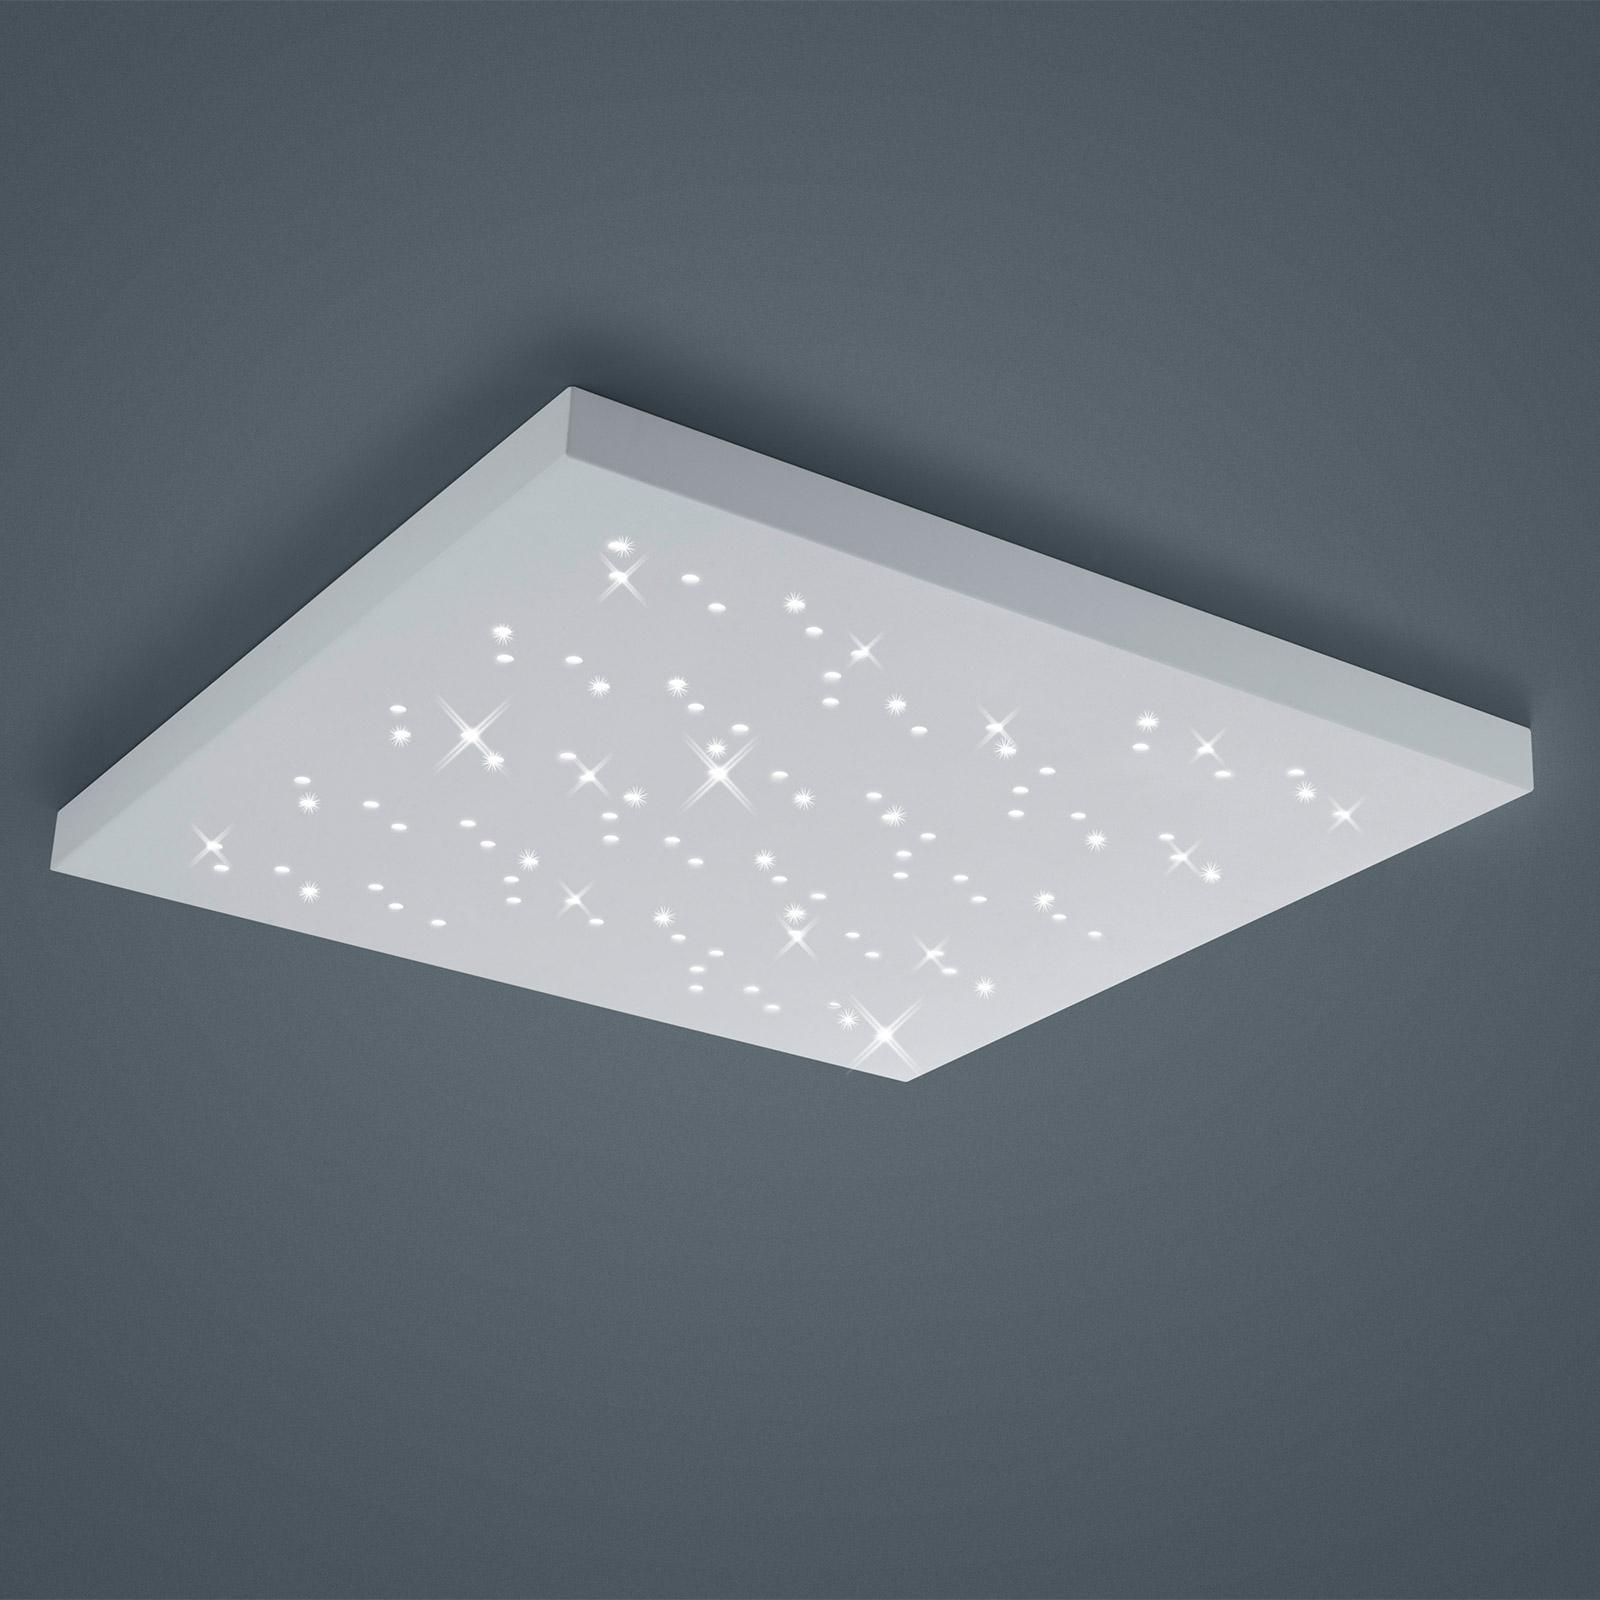 Lampa sufitowa LED Titus biała 75x75cm